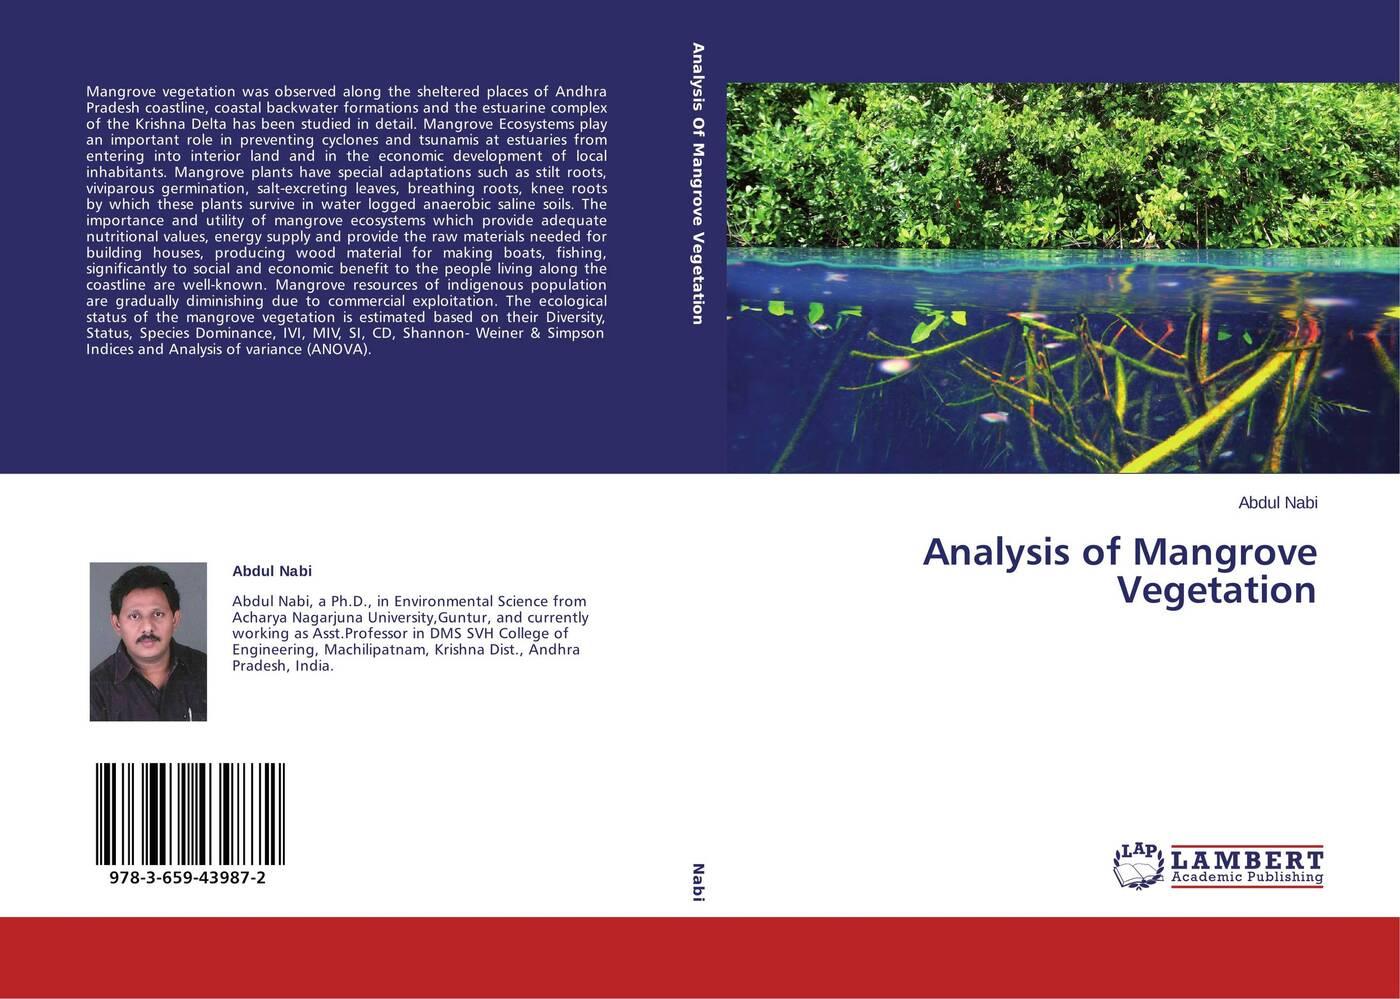 Abdul Nabi Analysis of Mangrove Vegetation цена в Москве и Питере